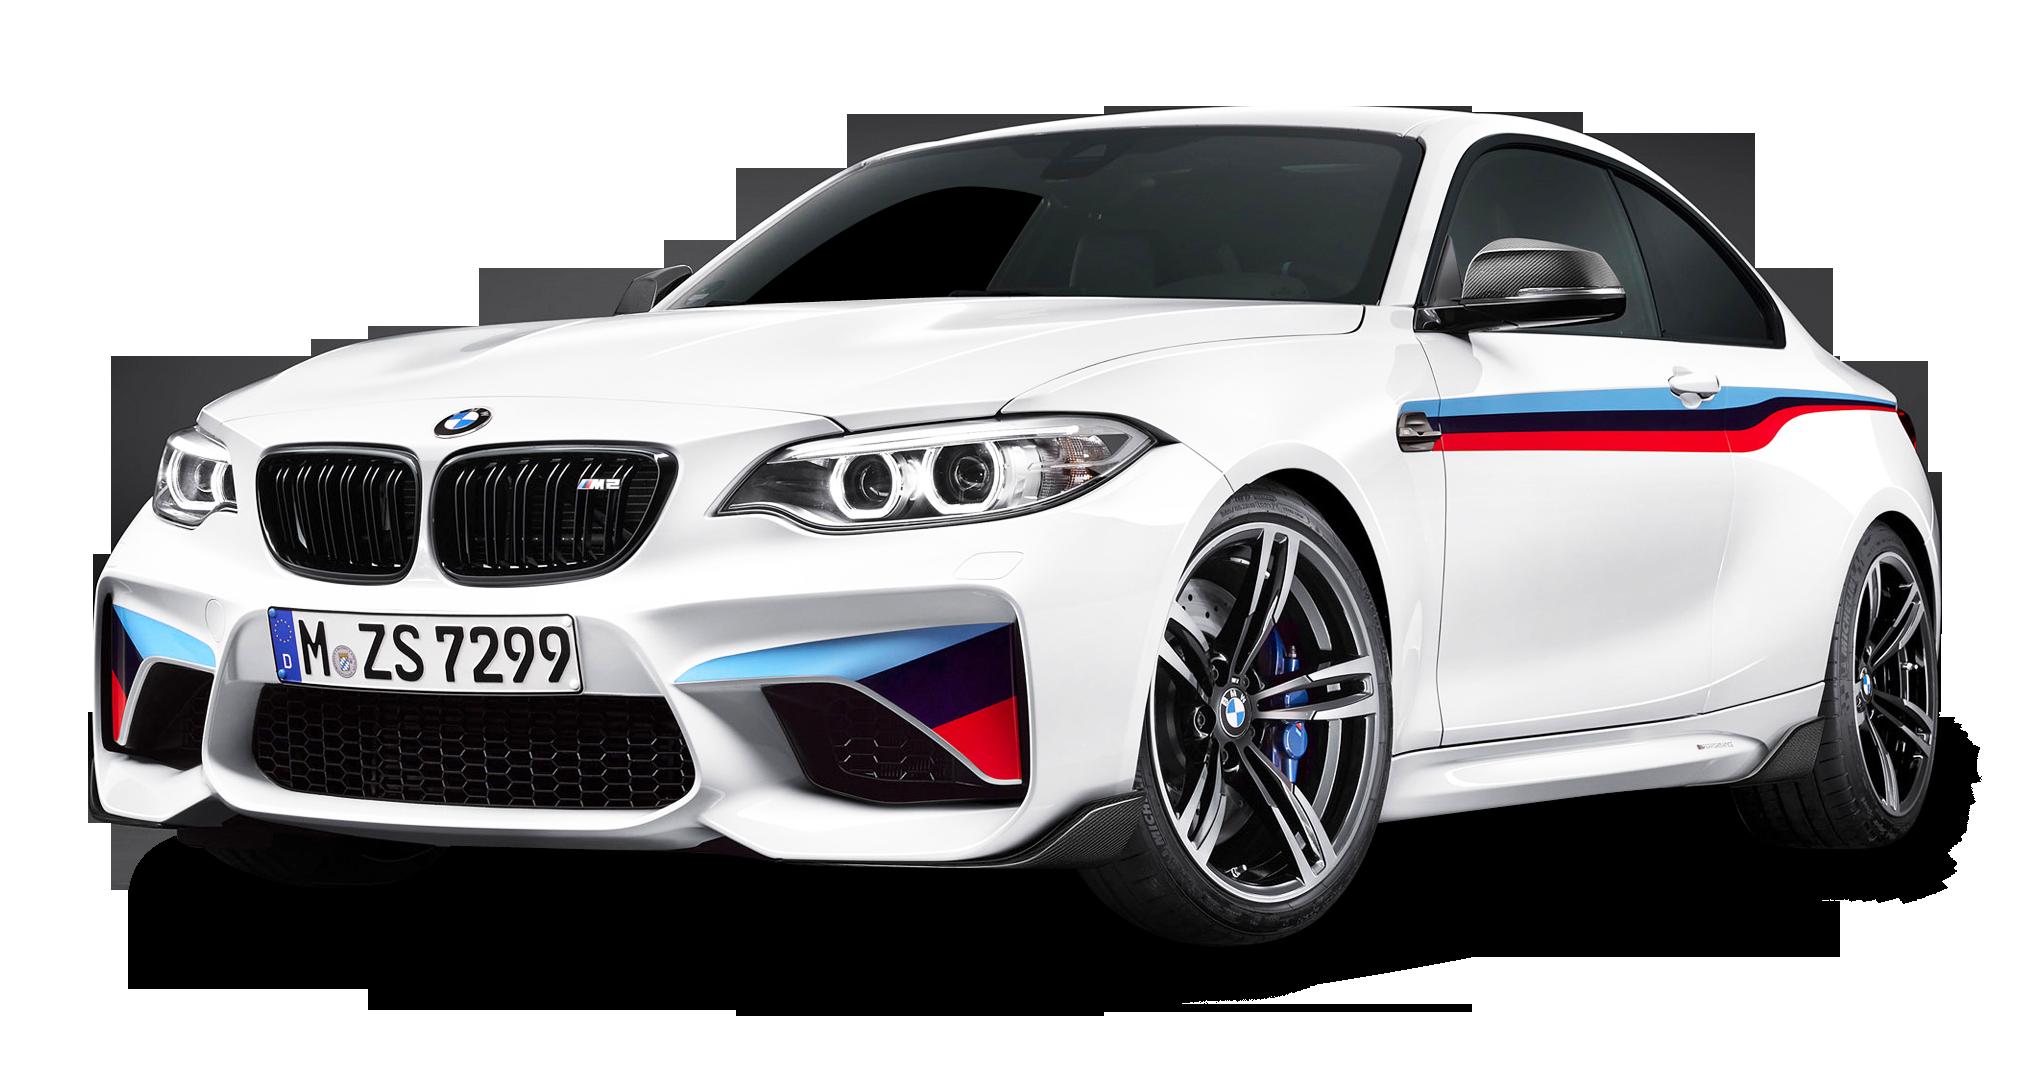 Bmw M2 Coupe White Car Png Image Purepng Free Transparent Cc0